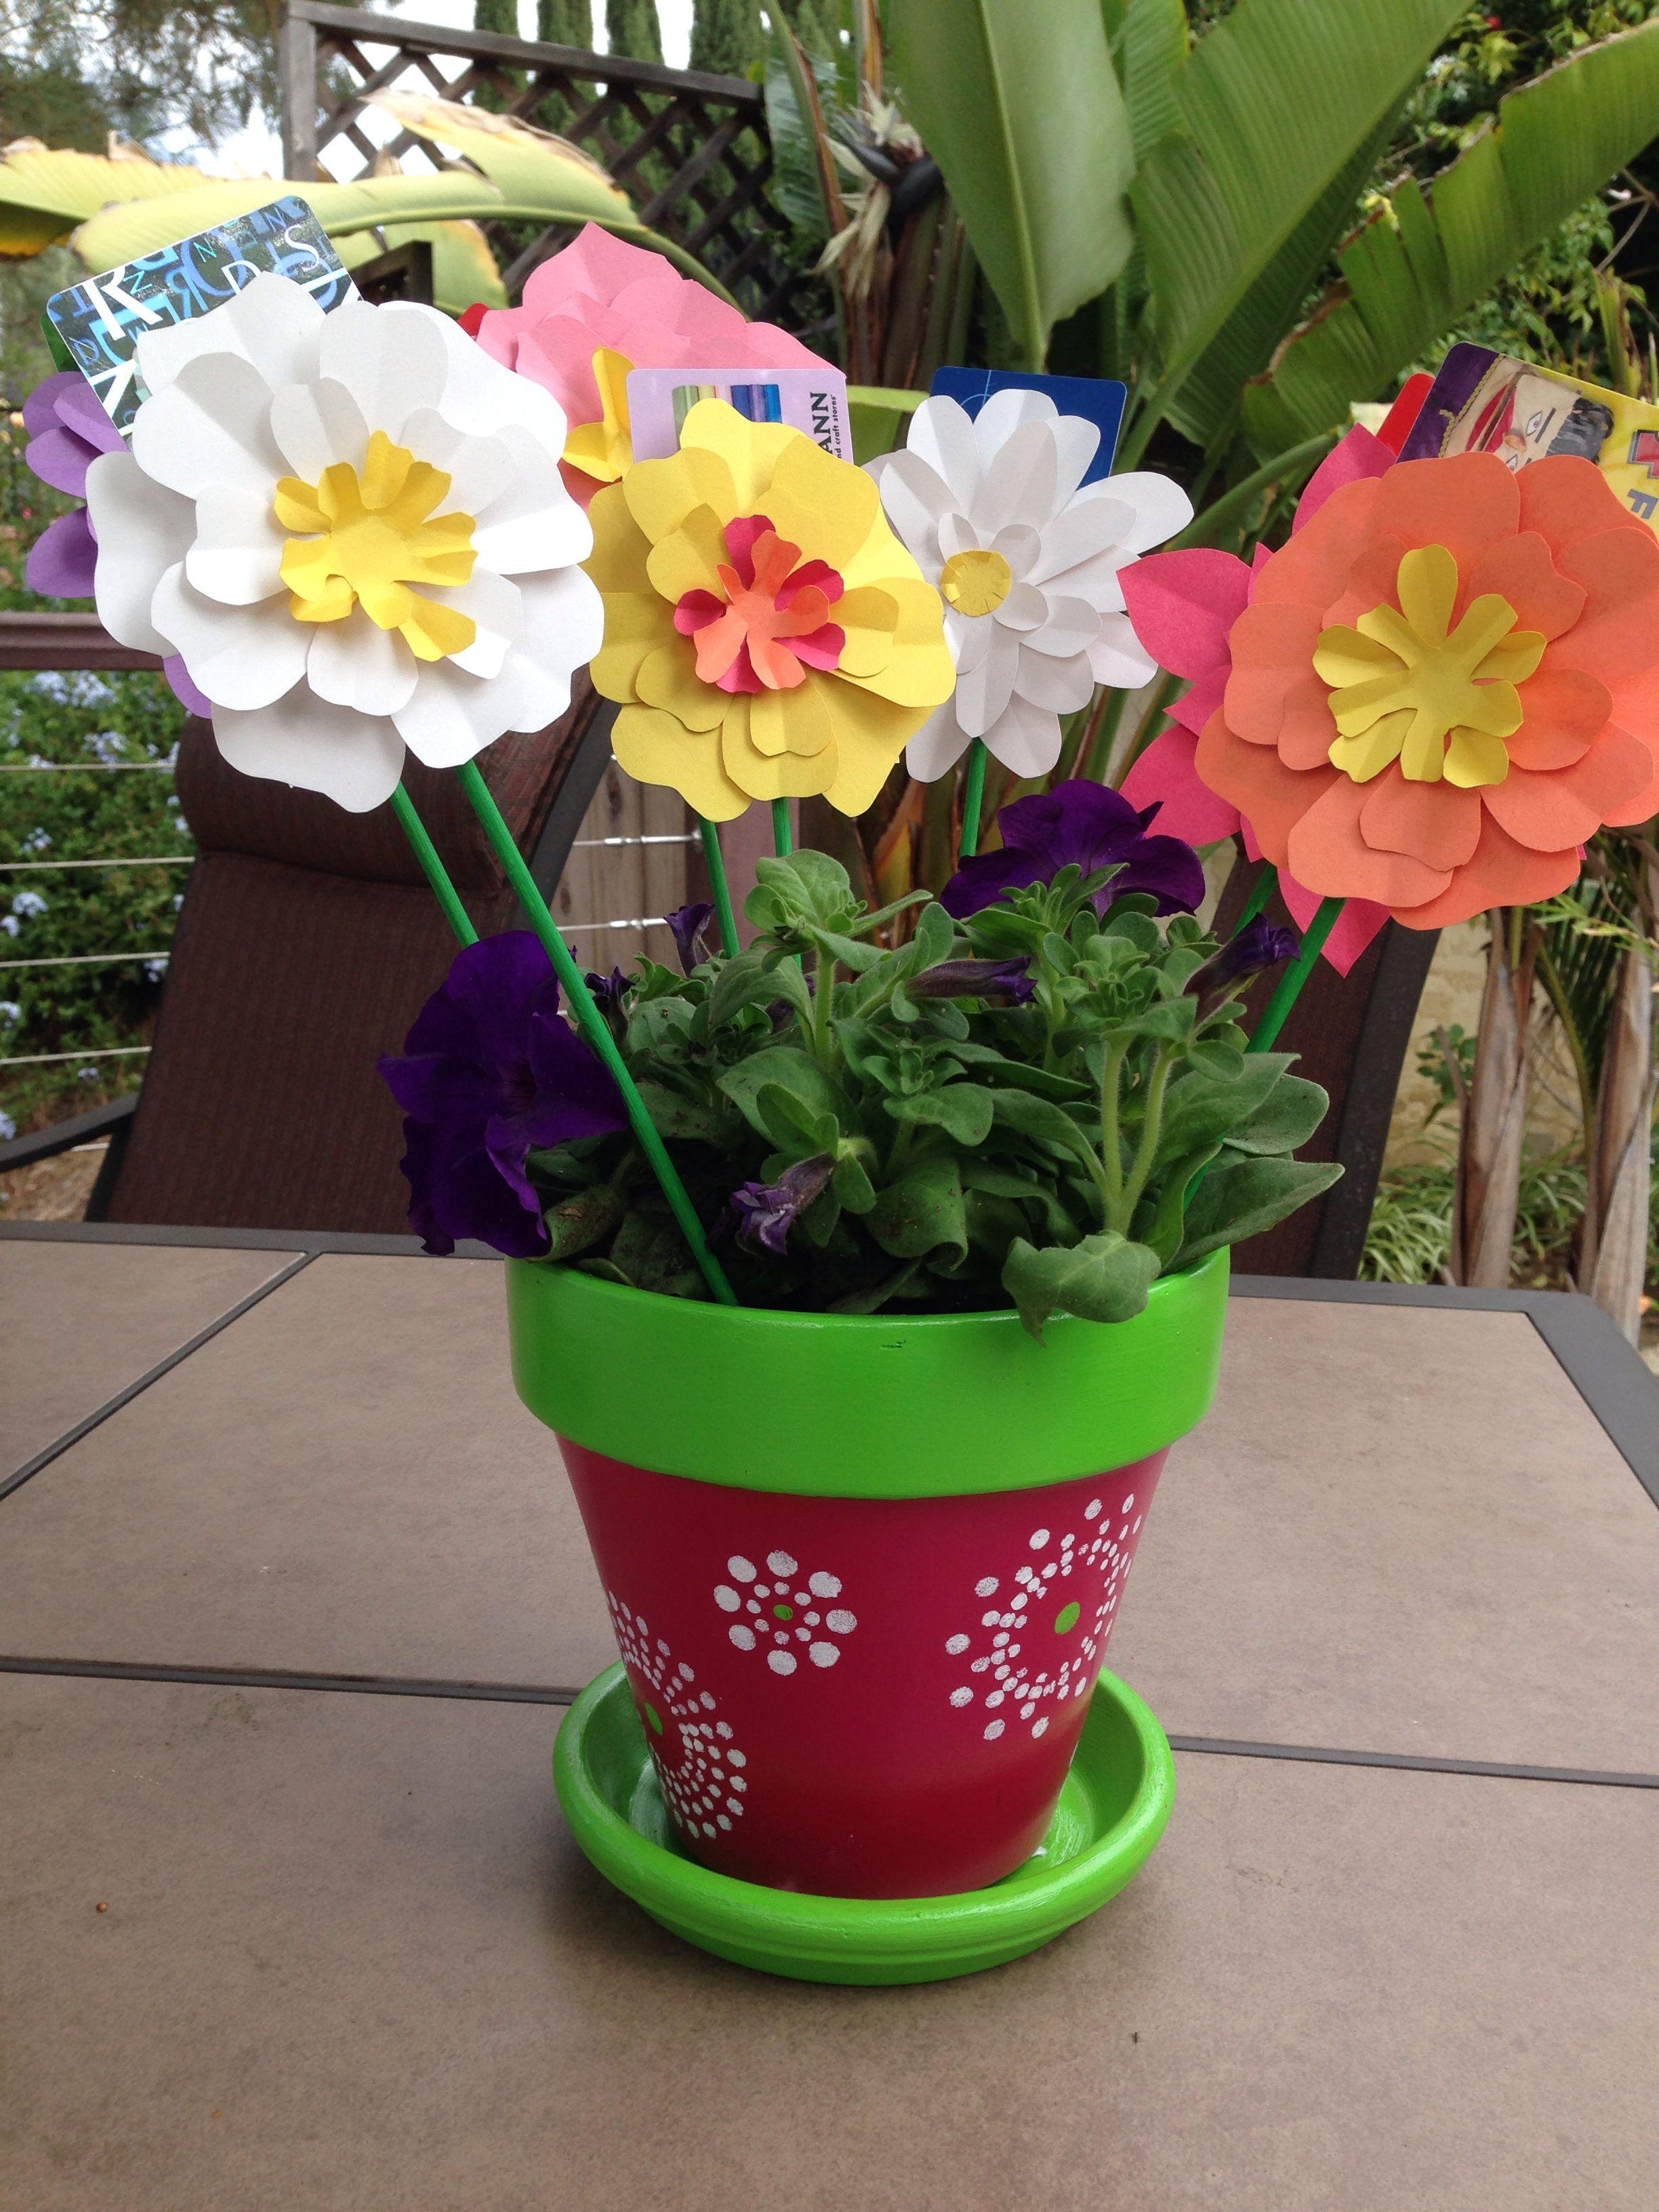 Gift card bouquet as a thank you gift for a teacher terra